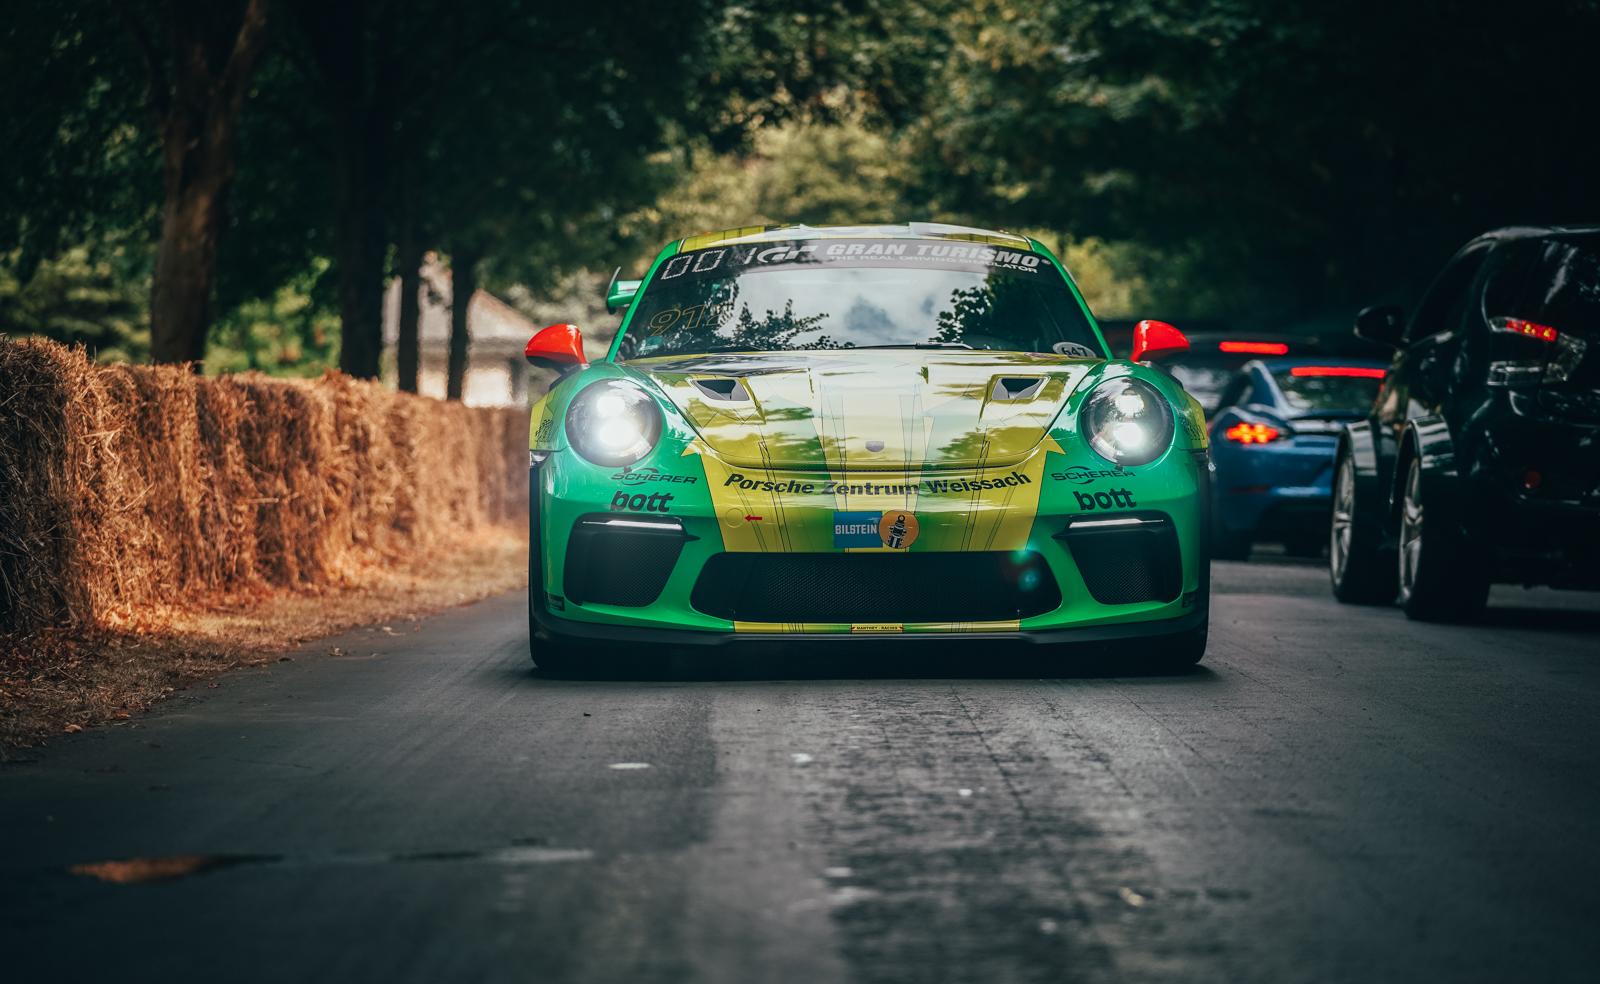 RP - Porsche Goodwood Fesitval of Speed 70 Years 2018-41.jpg